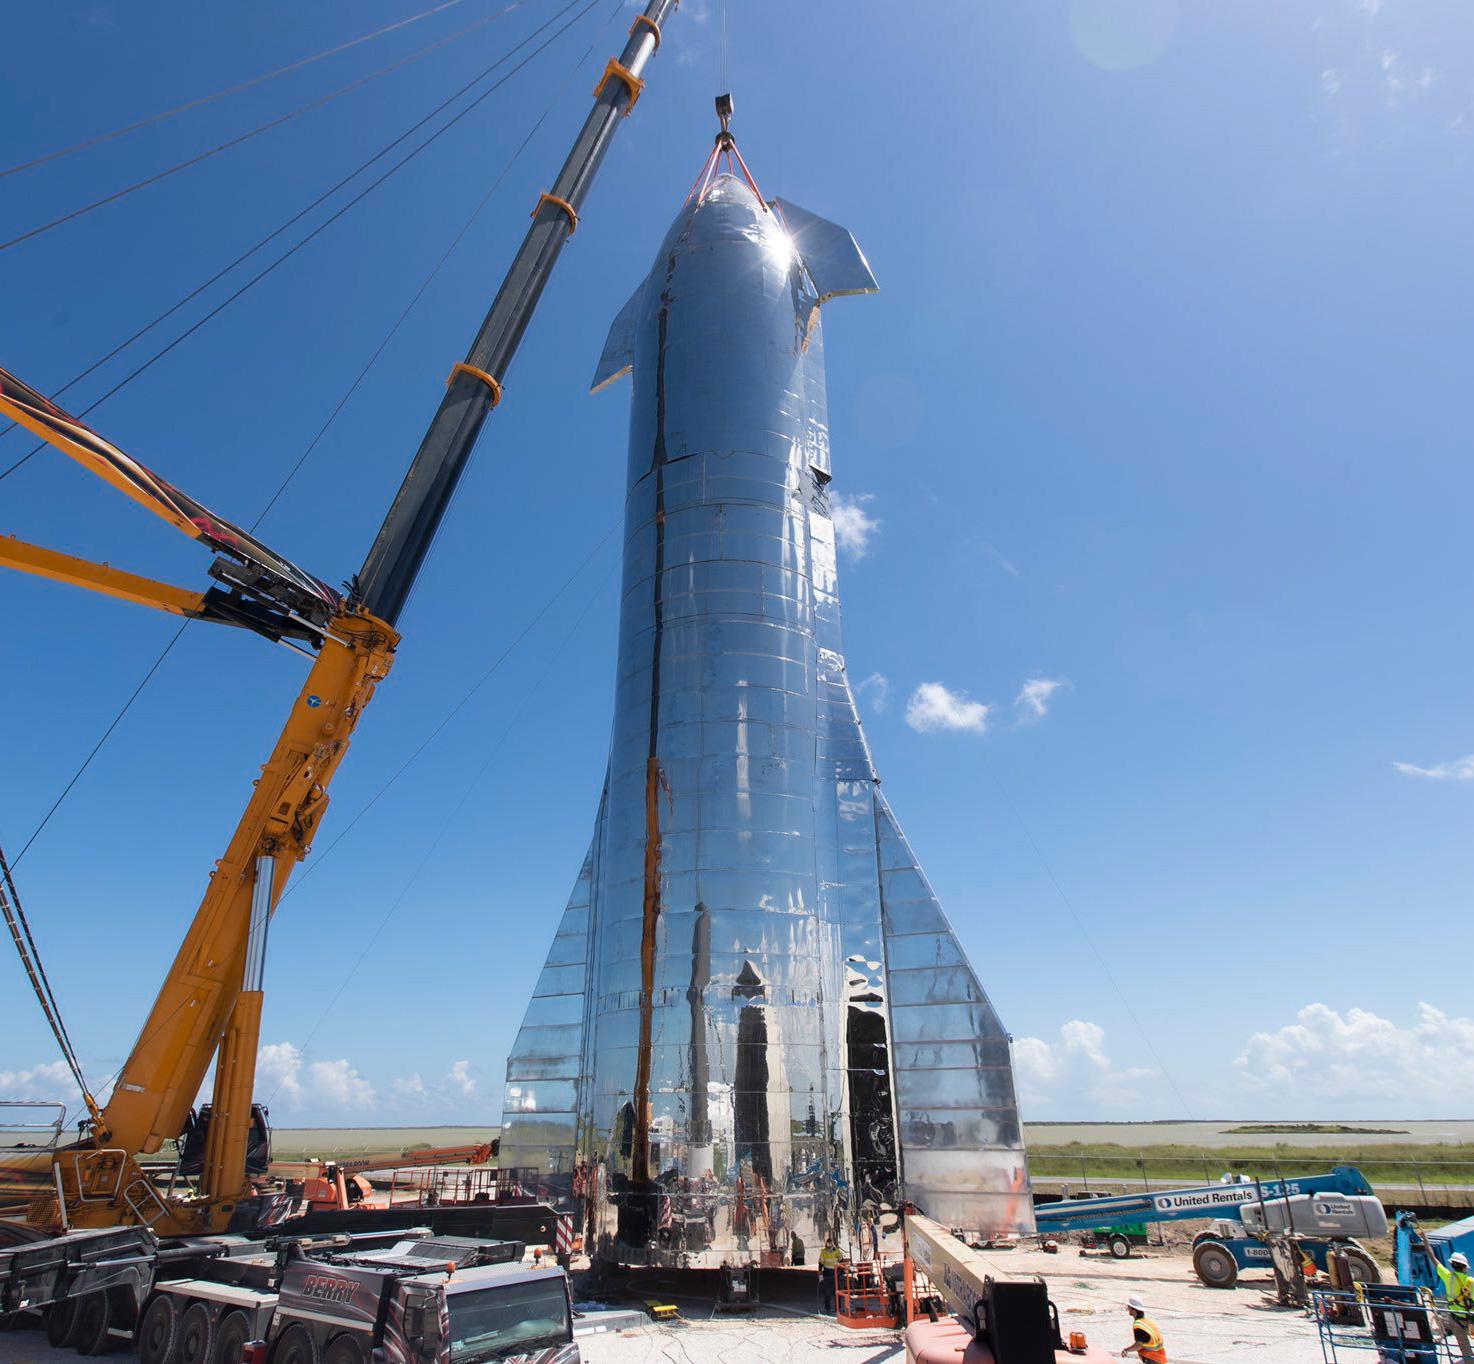 Elon Musk Starship Prototype BFR